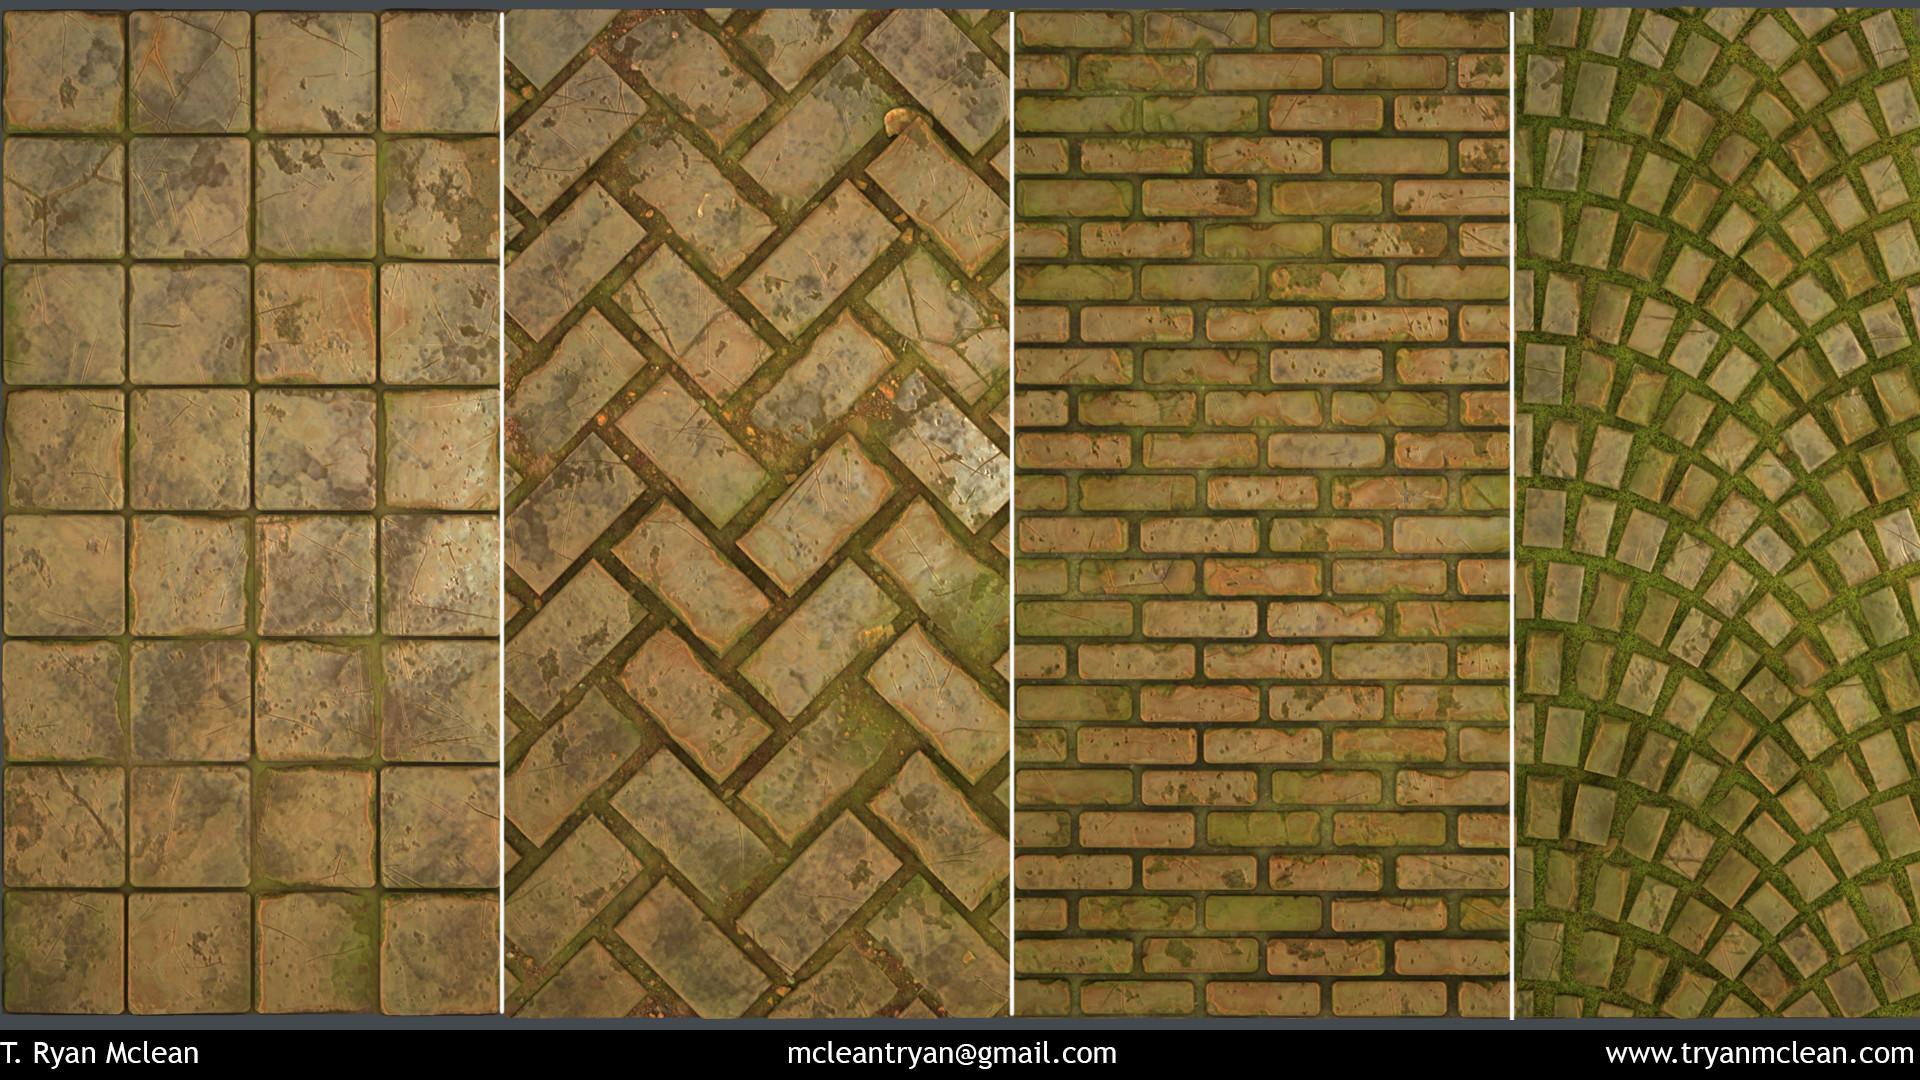 Flats of sample patterns. 8x8 tiles, herringbone, brick and arc cobblestone.